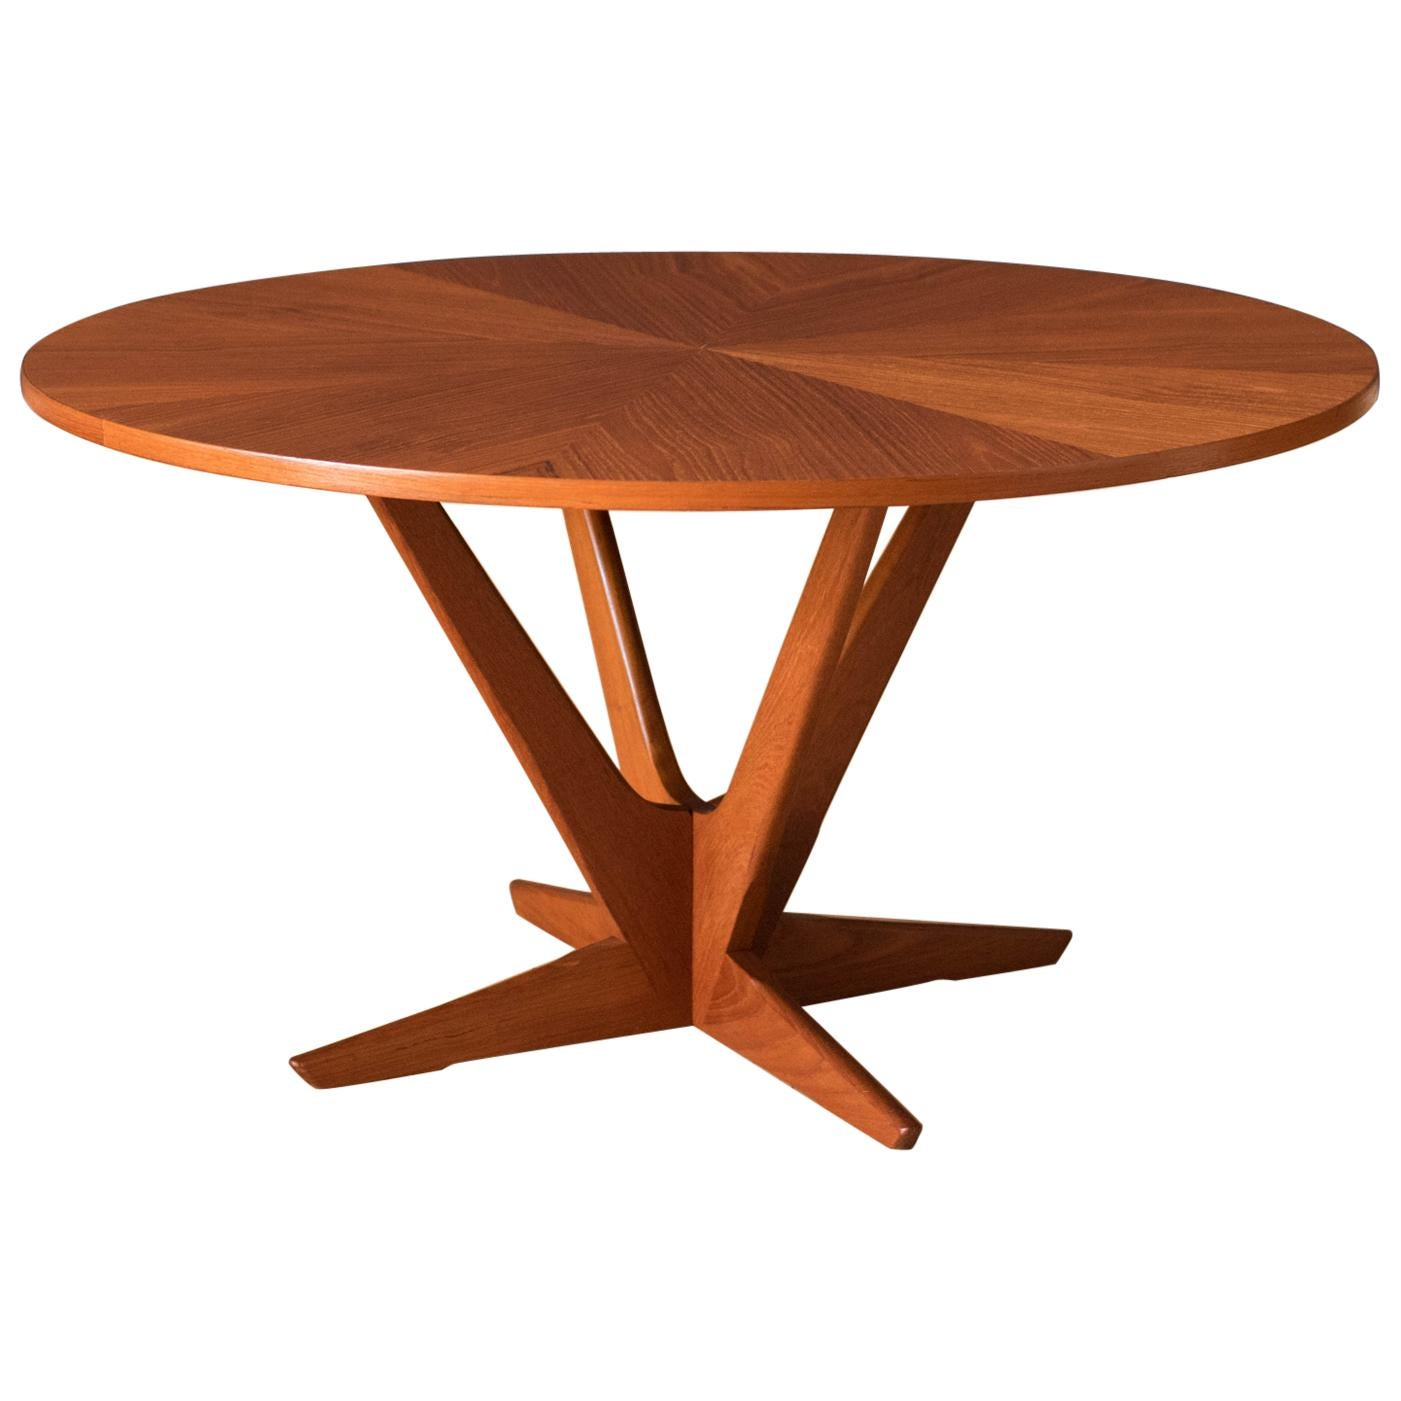 Vintage Danish Teak Occasional Coffee Table by Søren Georg Jensen for Kubus